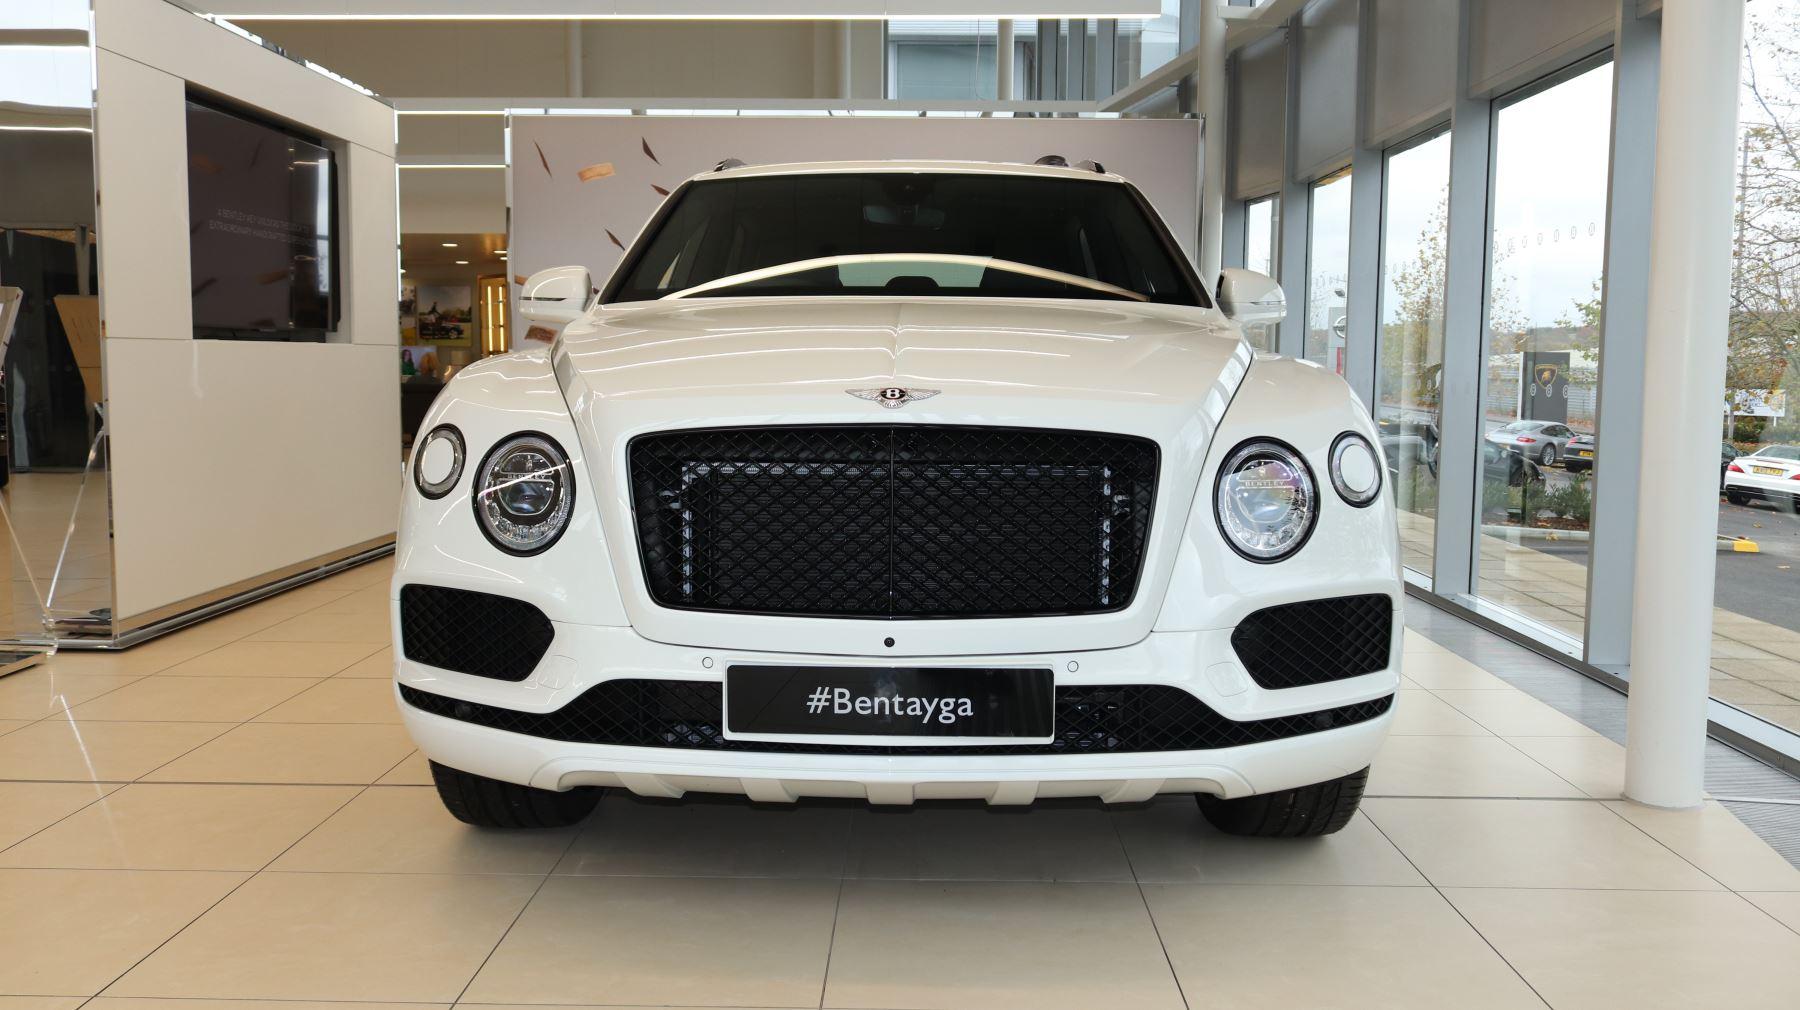 Bentley Bentayga 4.0 V8 5dr image 2